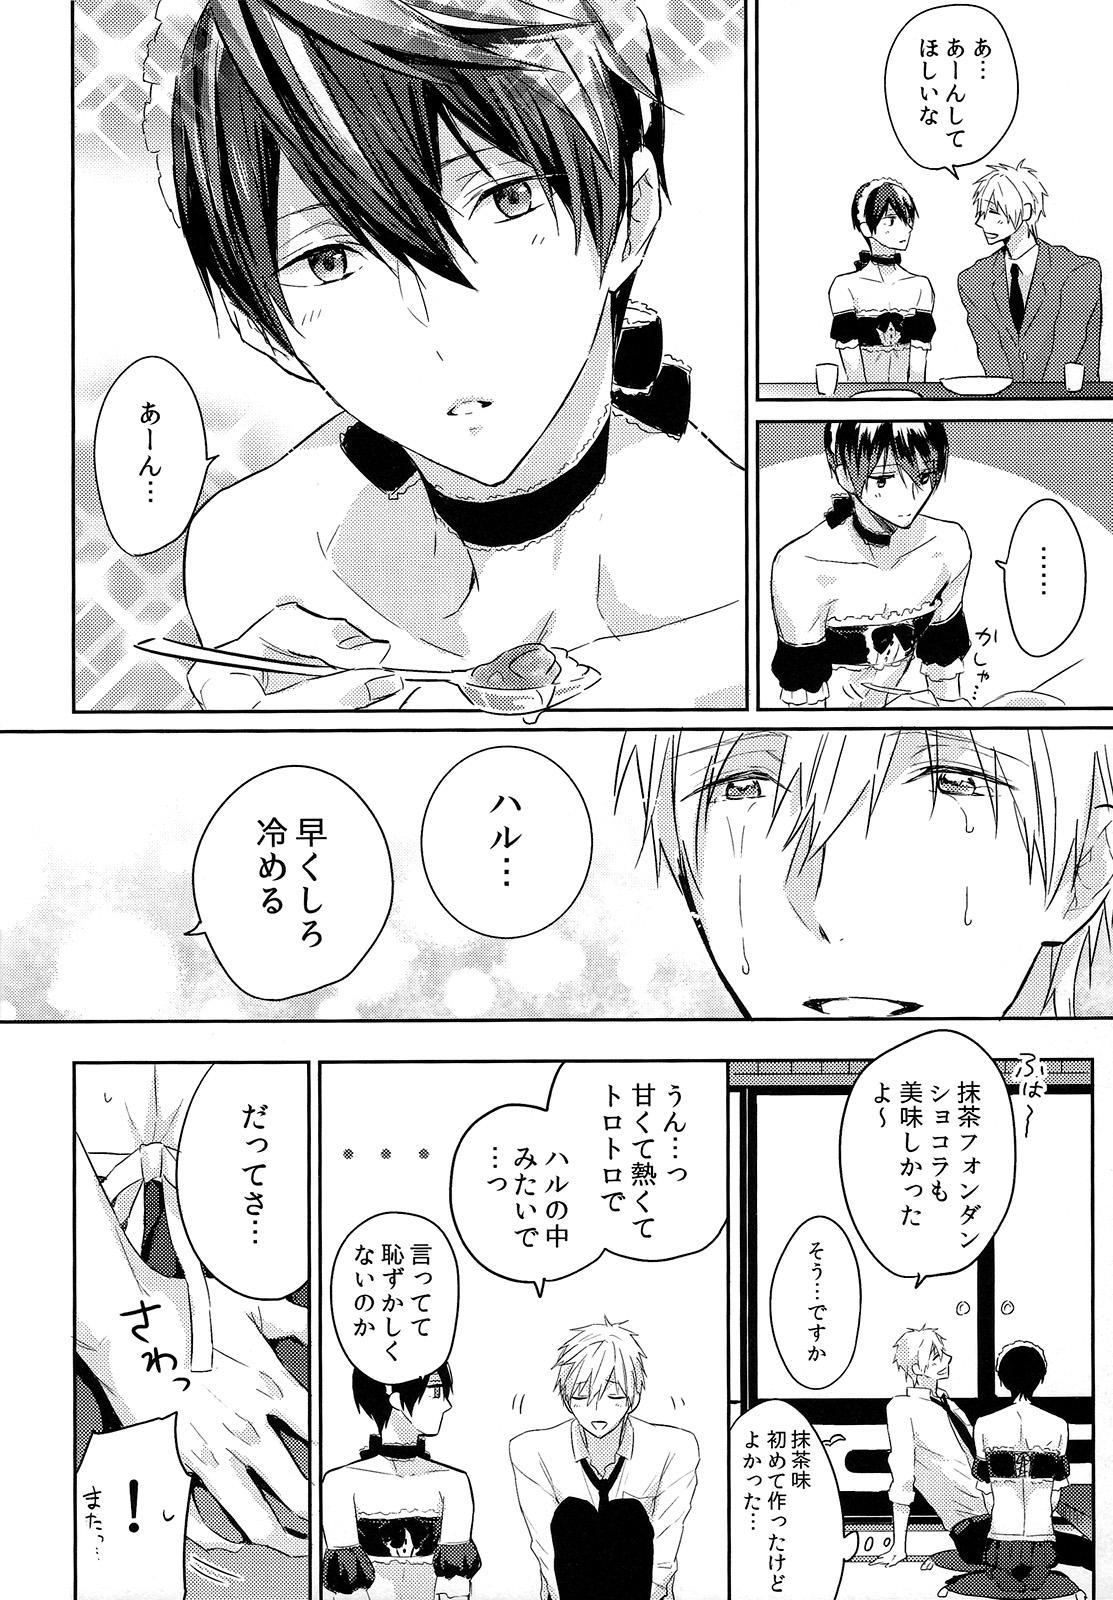 Kocchi Muite Maid-san 8